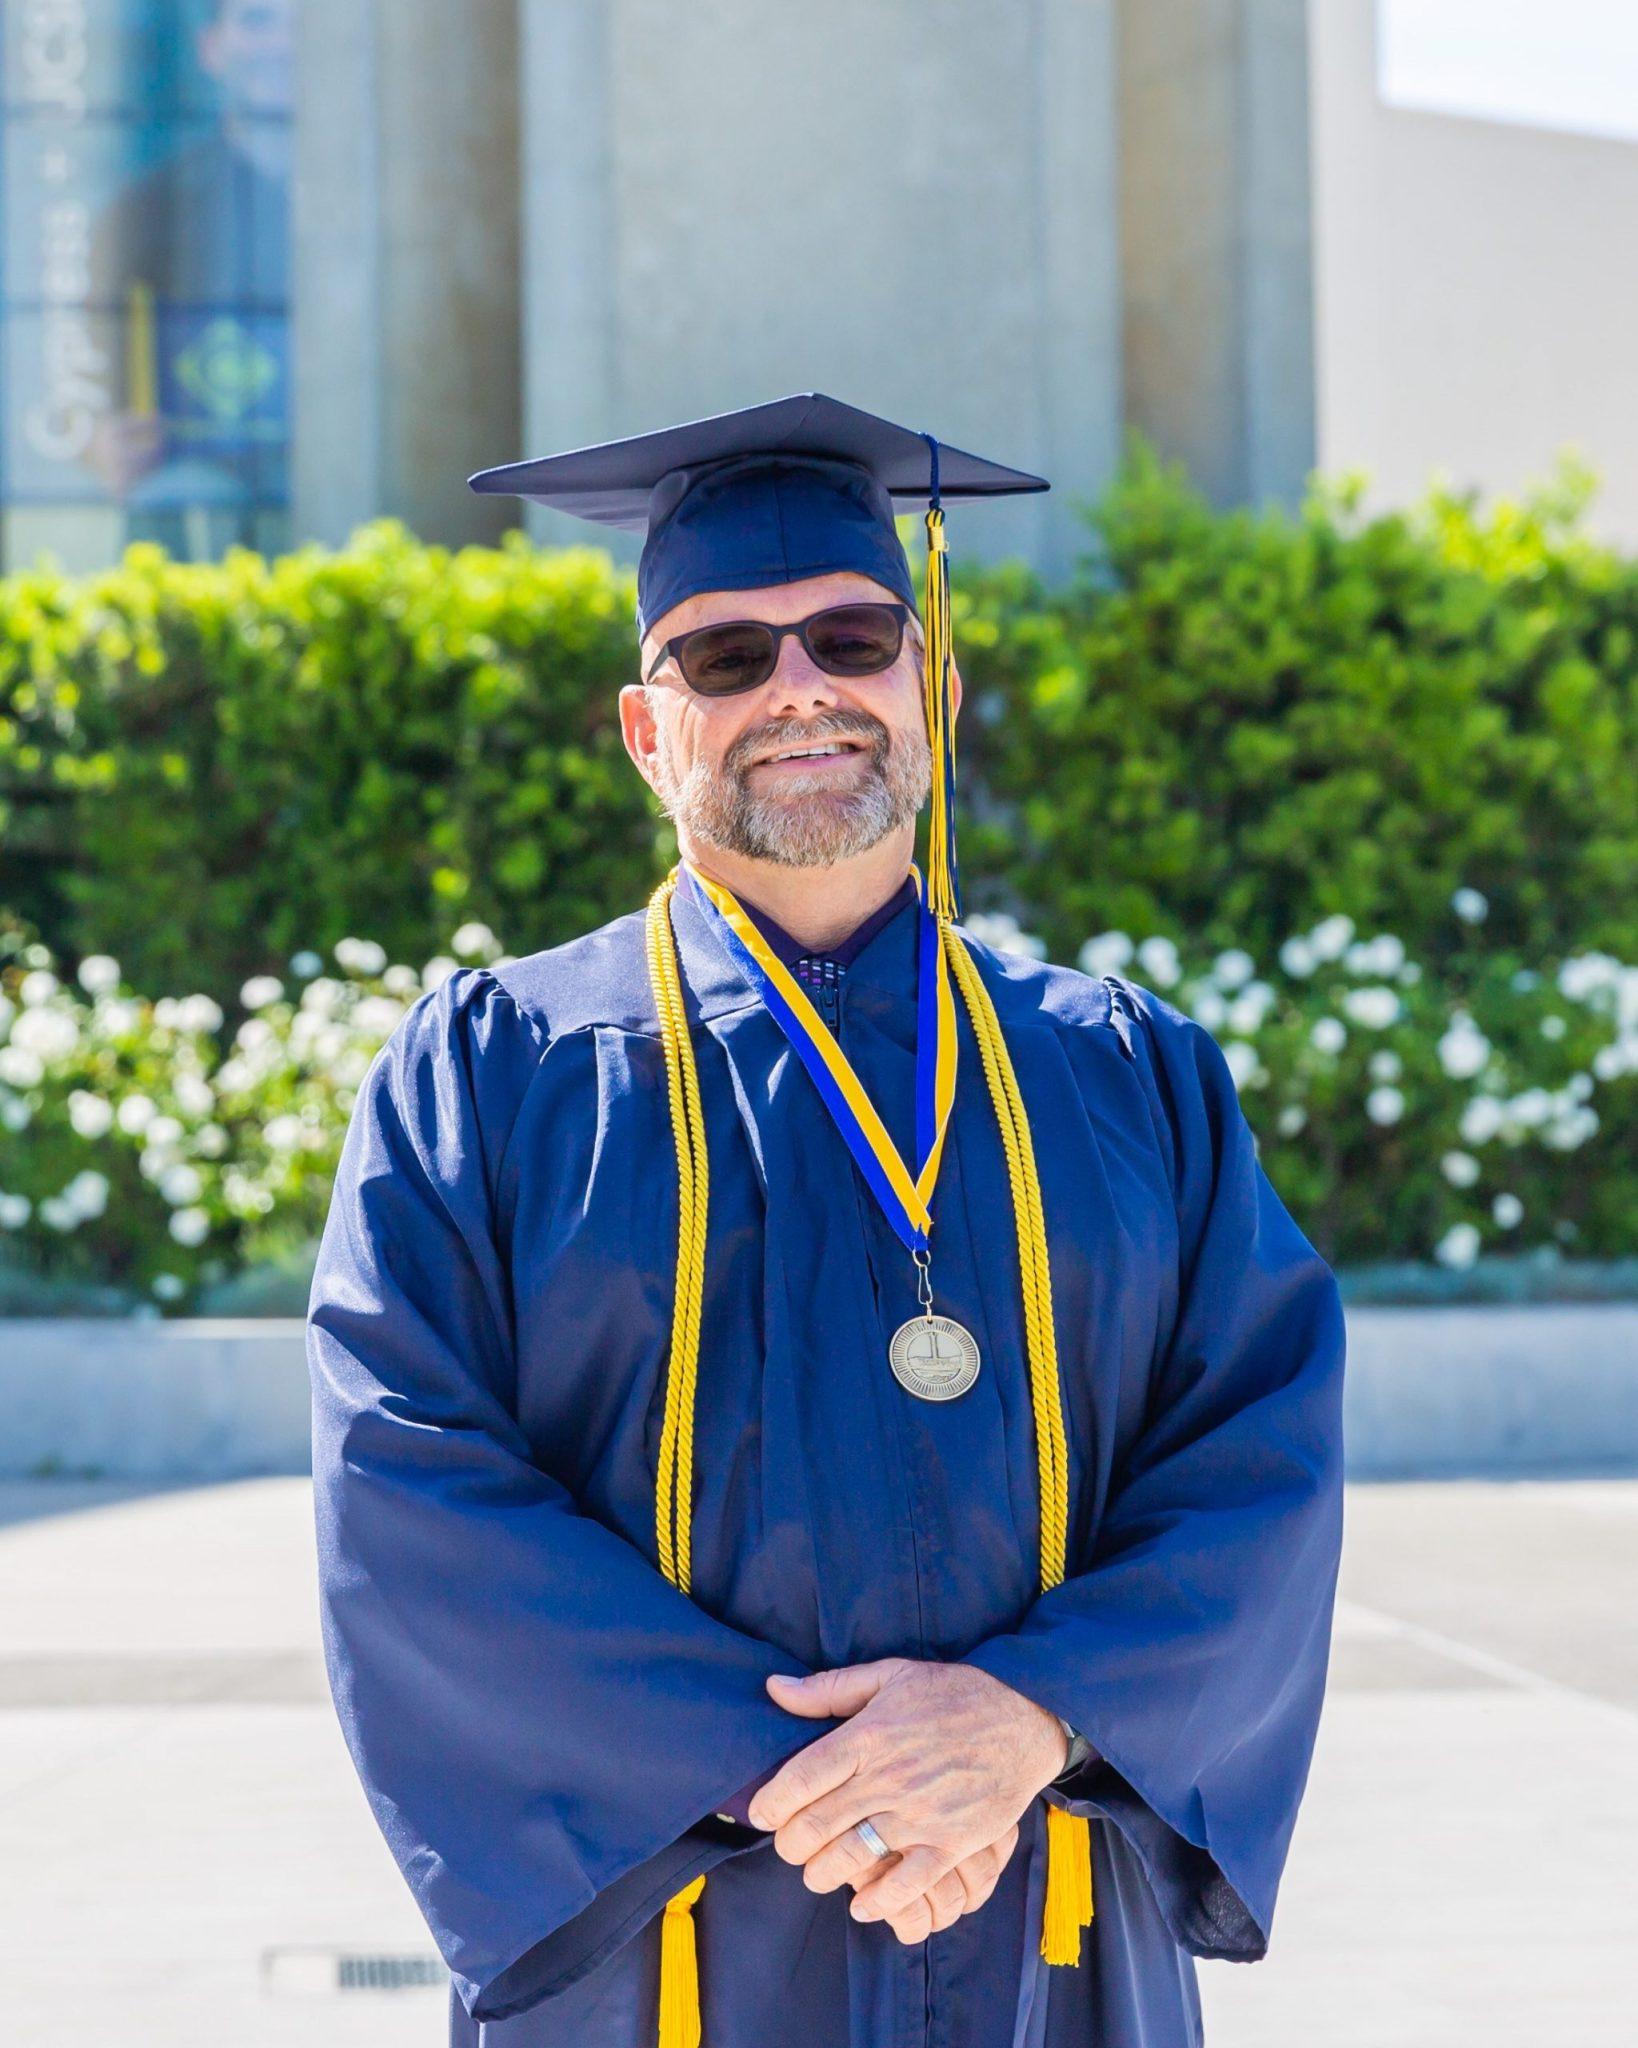 Presidential Scholar of Distinction, John Lasater, Career Technical Education